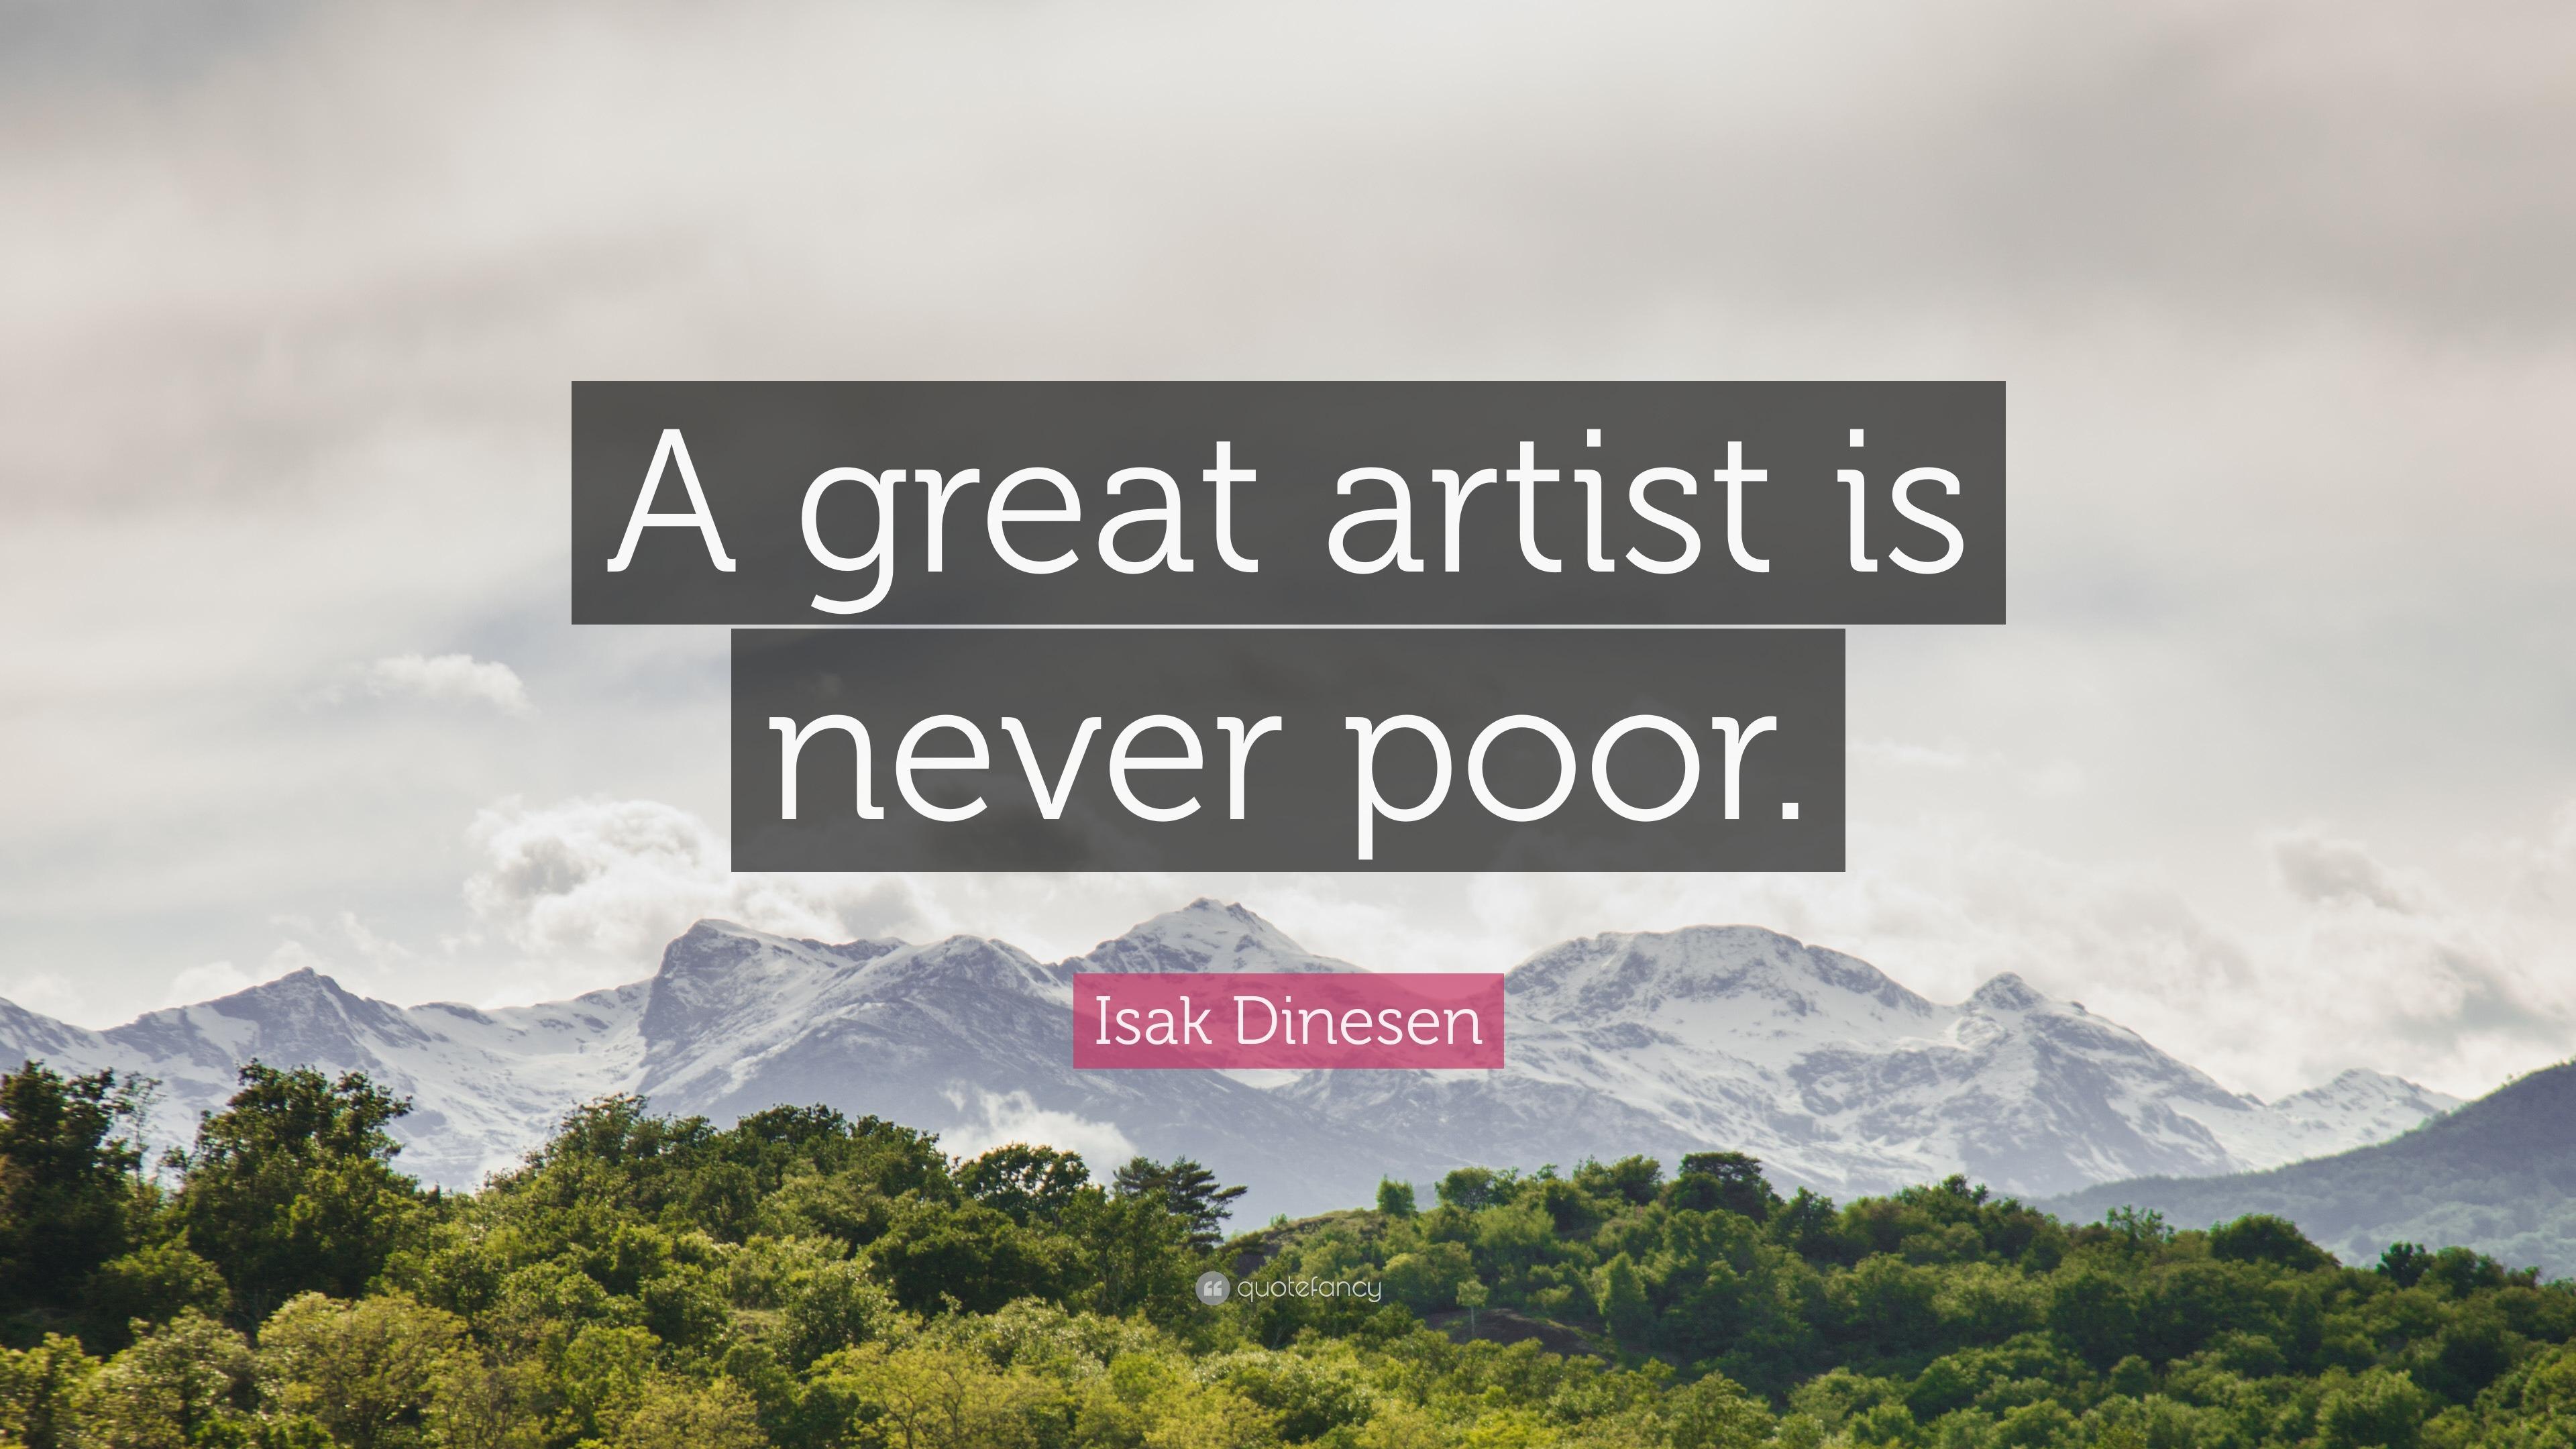 an artist is never poor